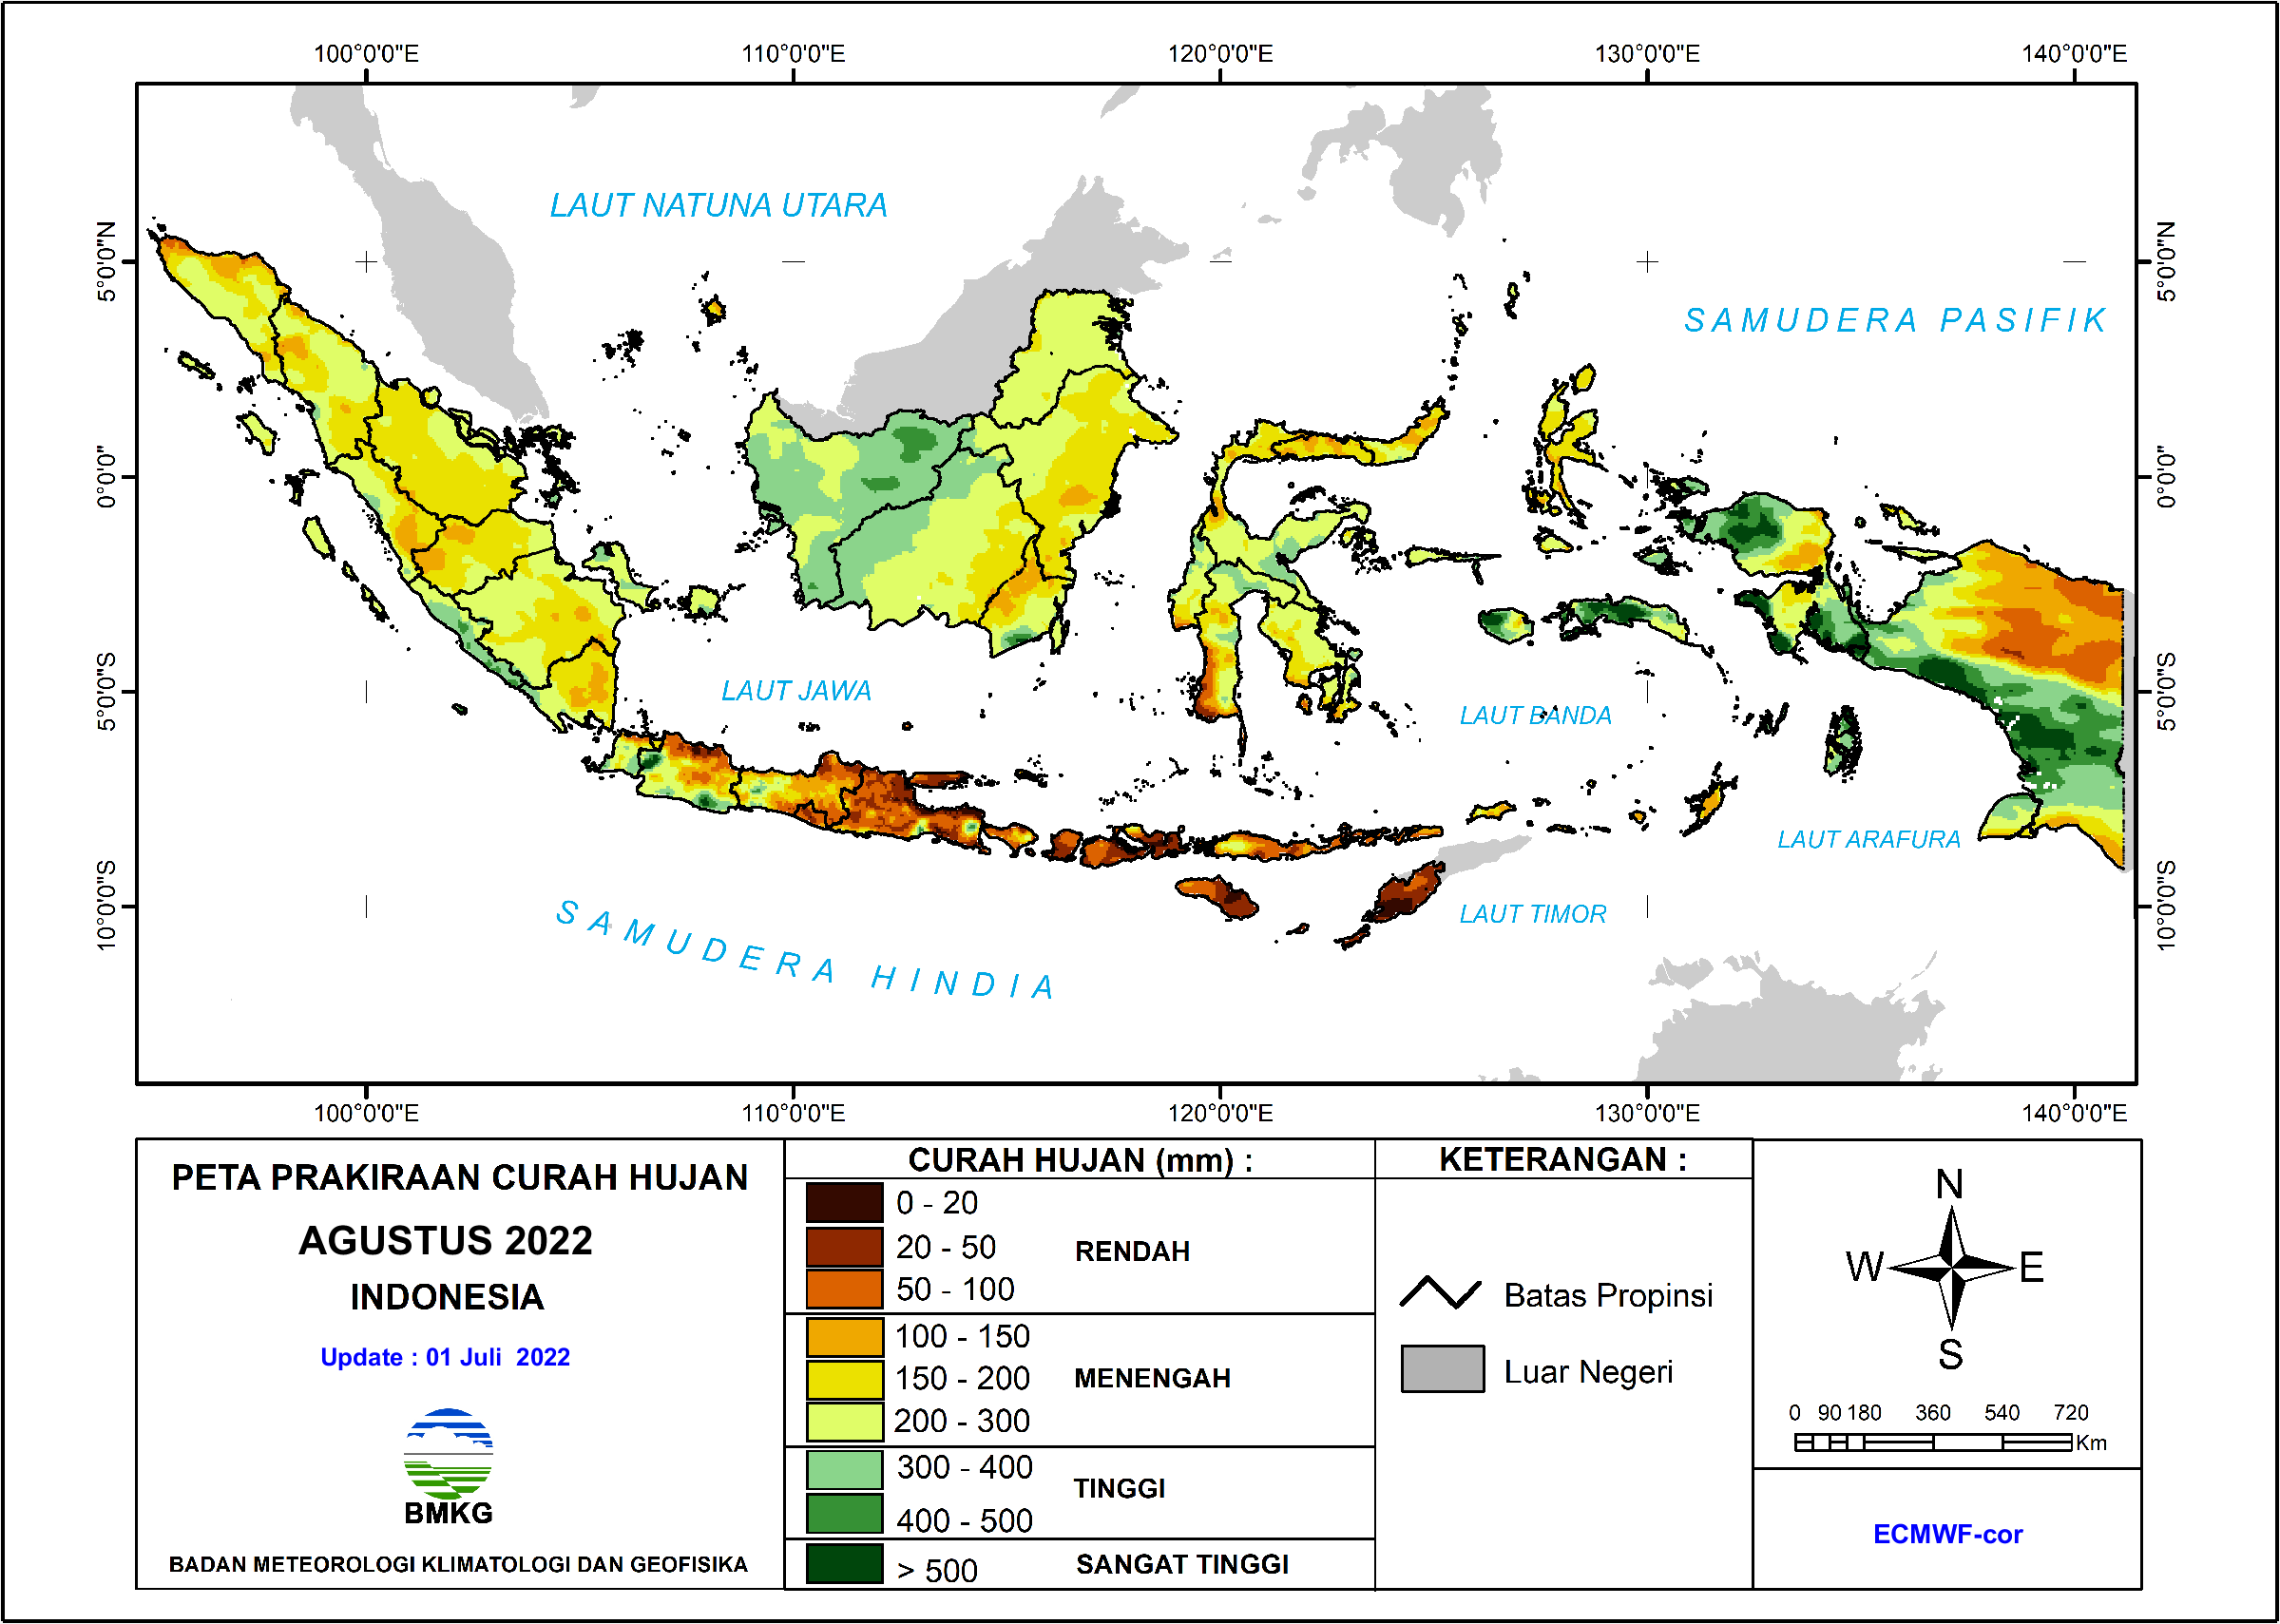 Prakiraan Curah Hujan Bulanan - Indonesia